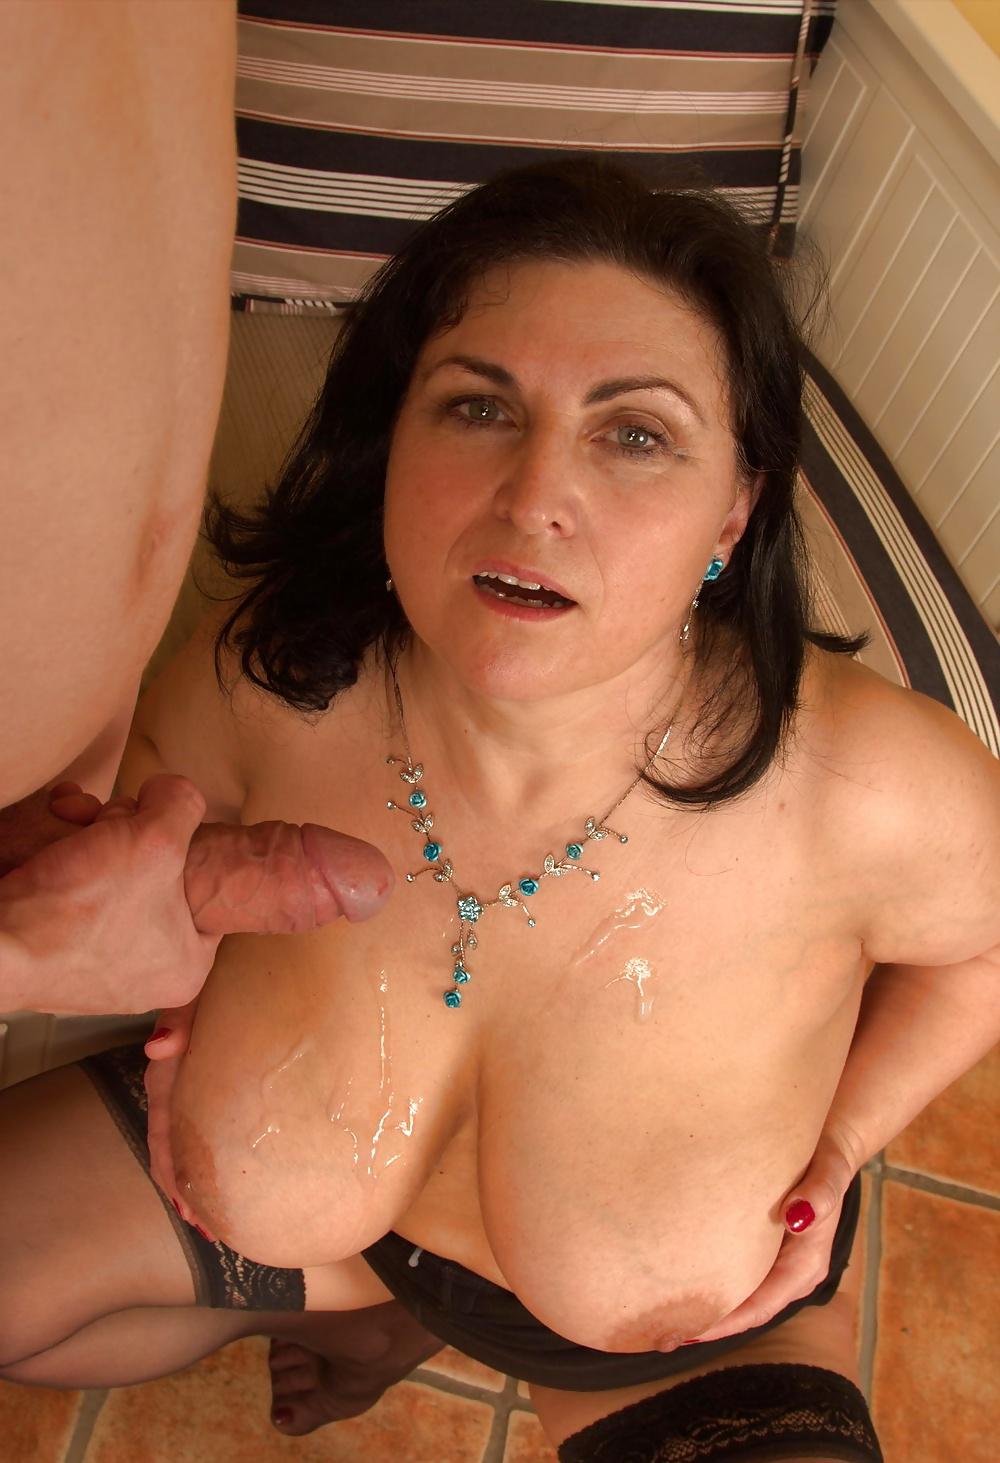 Mature breast porn, hot pornostars